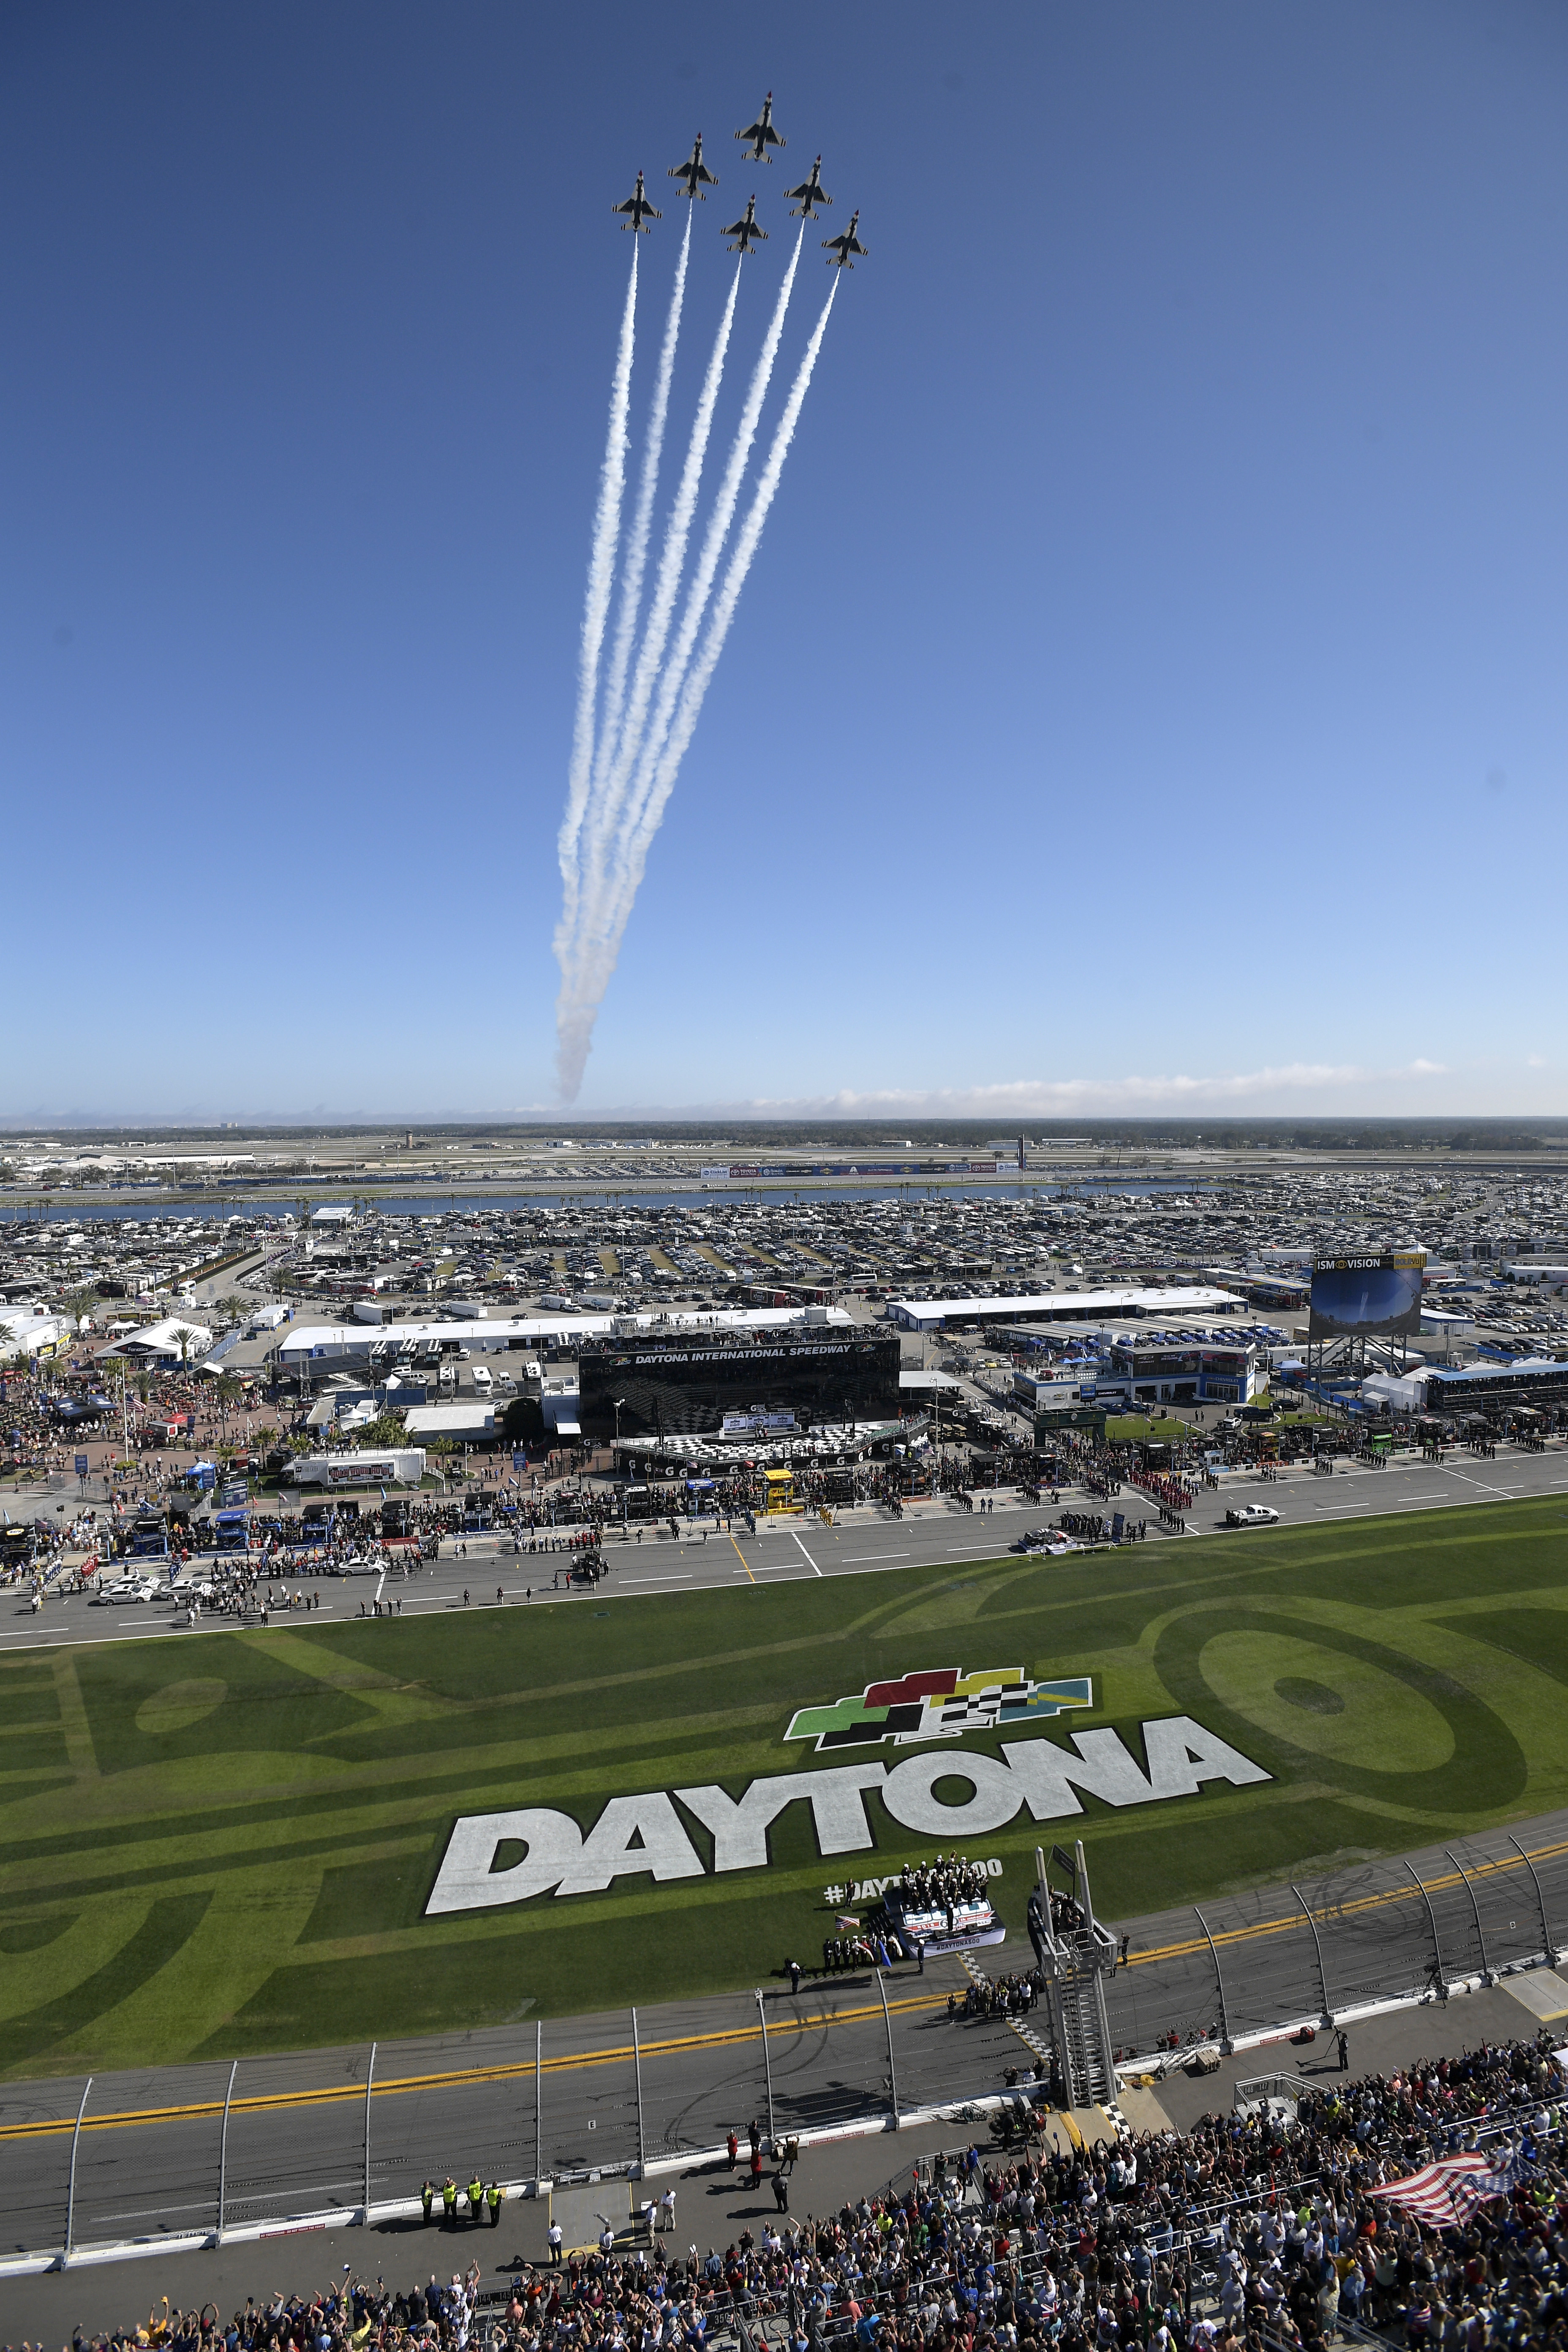 The U.S. Air Force Thunderbirds perform a flyover during the national anthem before the NASCAR Daytona 500 auto race at Daytona International Speedway Sunday, Feb. 18, 2018, in Daytona Beach, Fla. (Phelan M. Ebenhack/AP Photo)